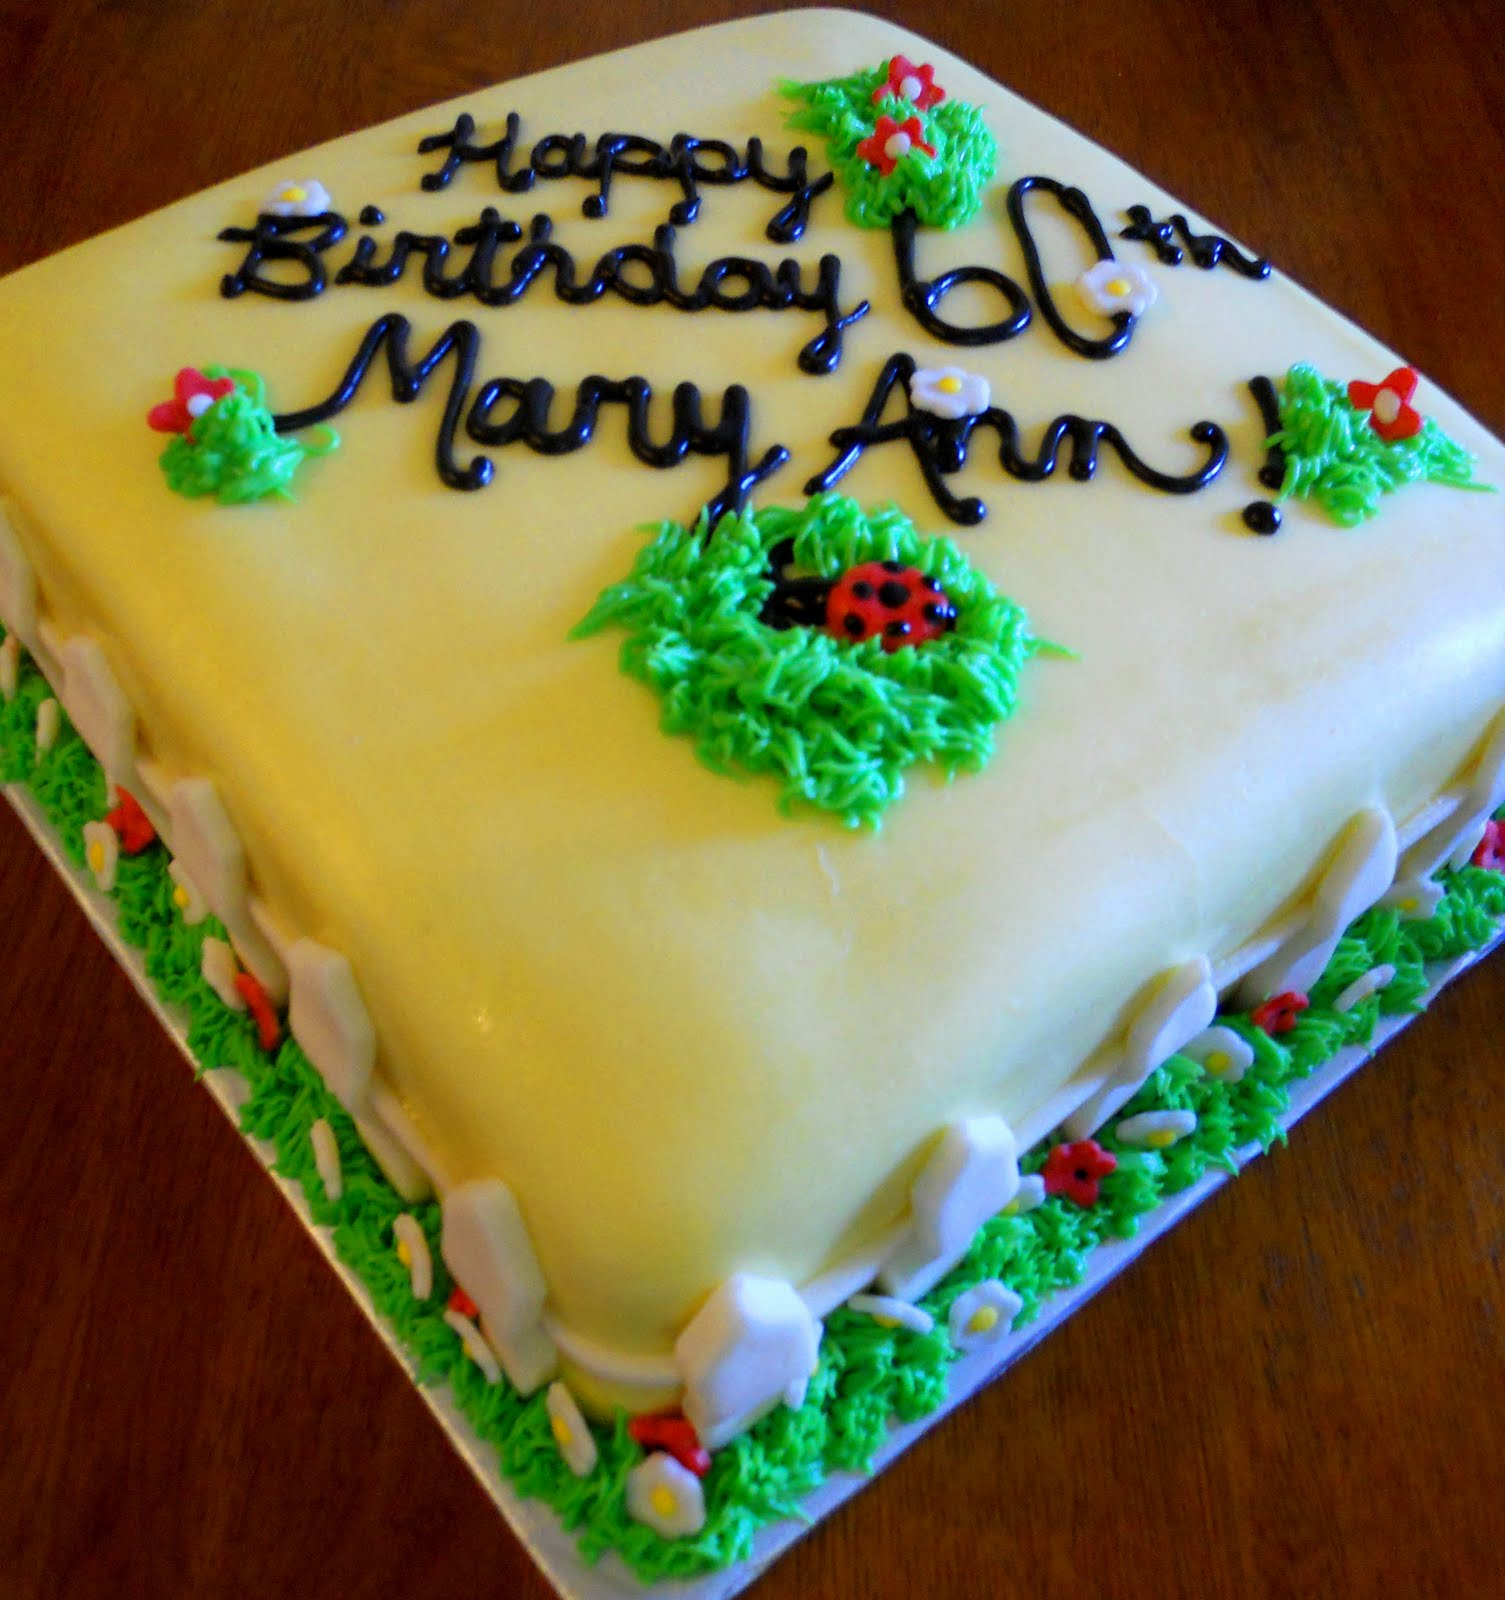 Lins Kitchen Mary Anns 60th Birthday